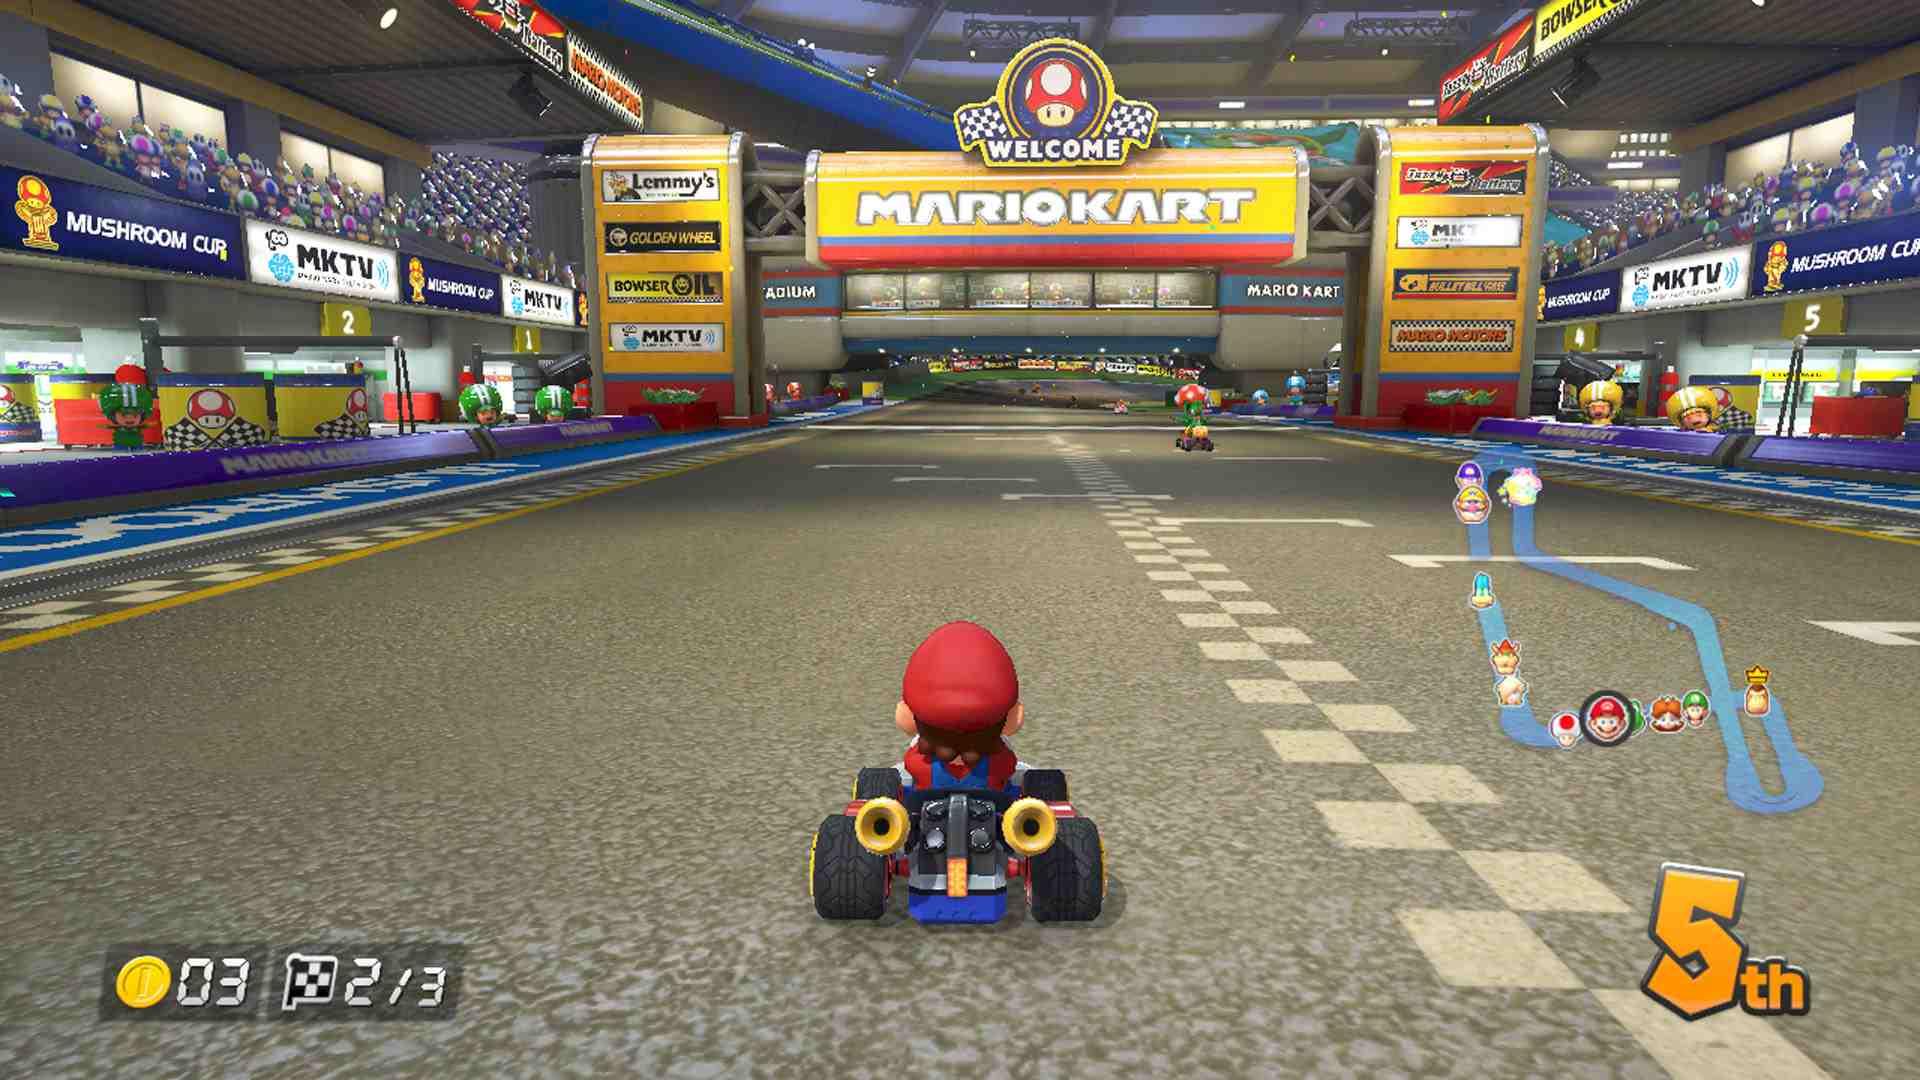 Mario Kart 8 onscreen map